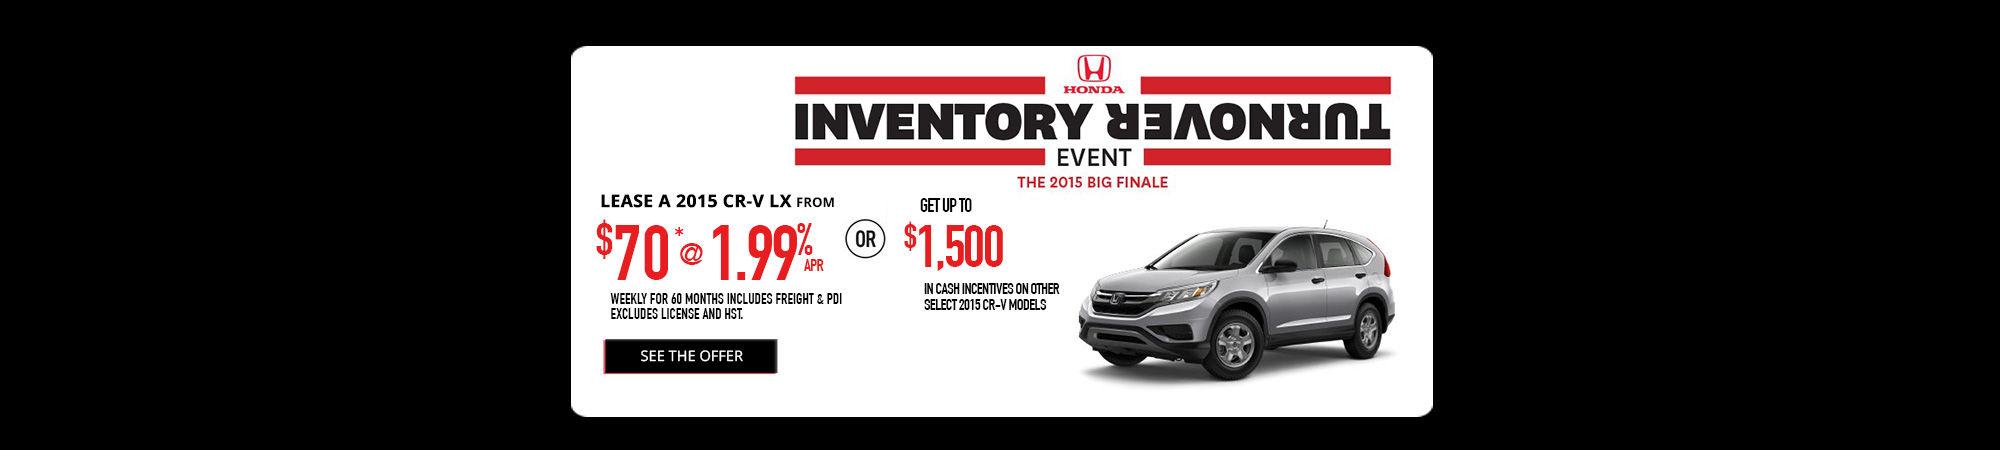 Inventory Turnover -  CR-V